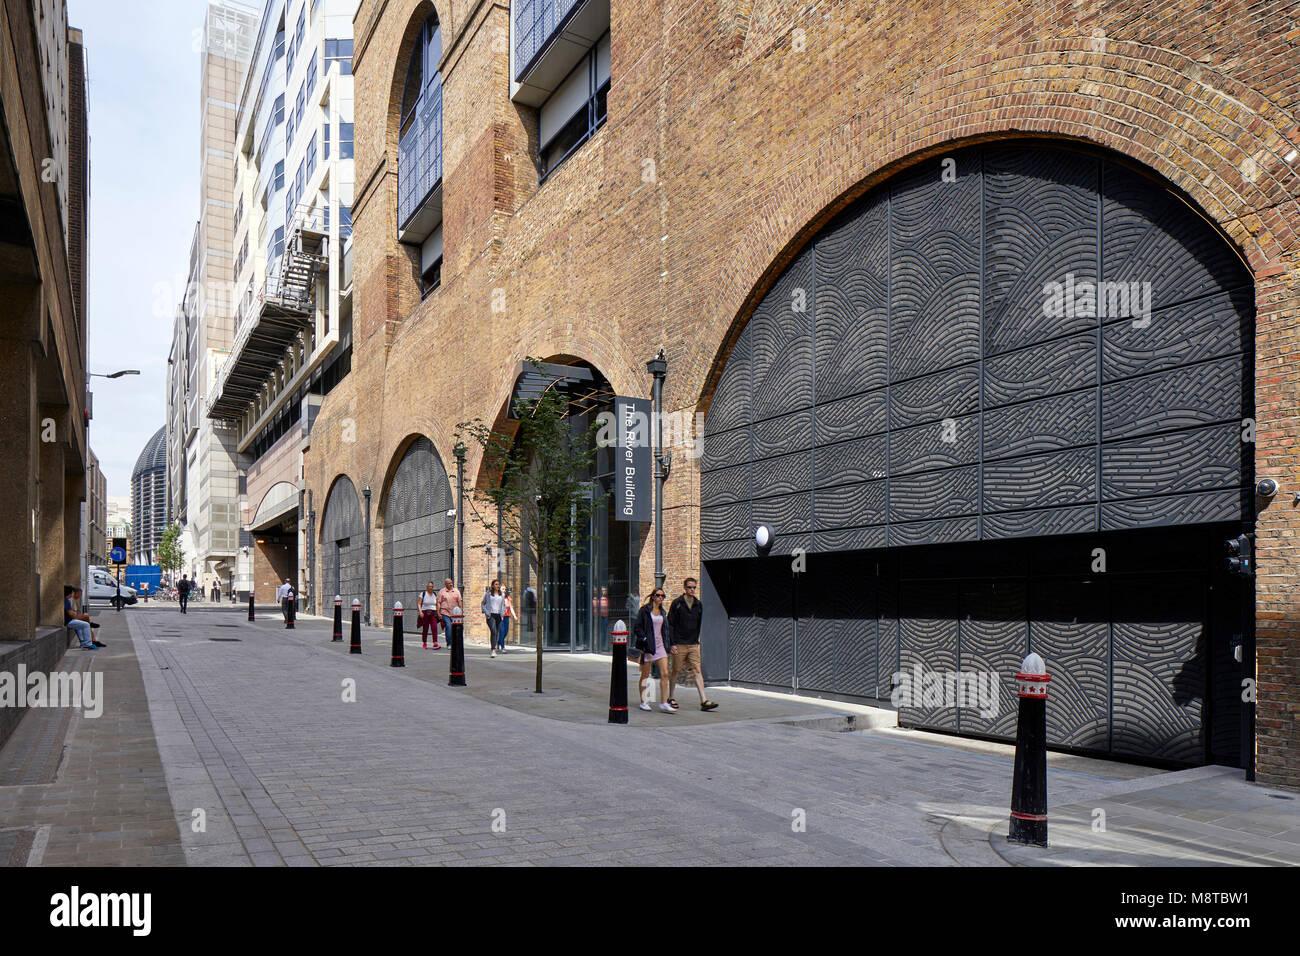 Exterior facade. The River Building, London, United Kingdom. Architect: Stiff + Trevillion Architects, 2017. - Stock Image